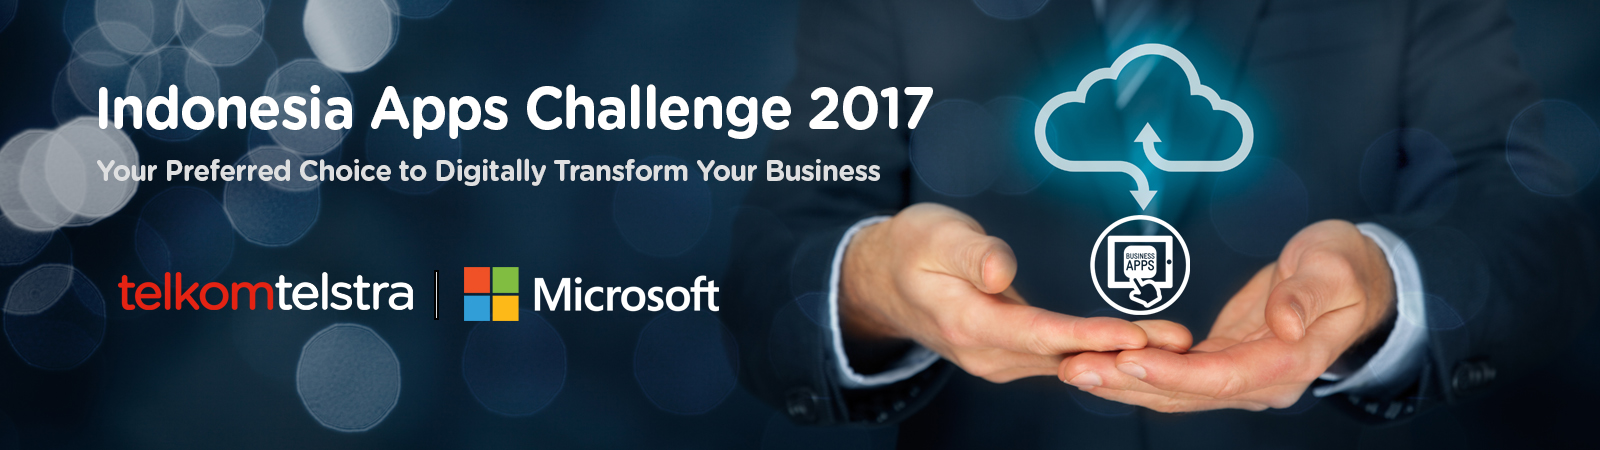 Telkomtelstra bersama Dicoding Gelar Indonesia Application Challenge 2017